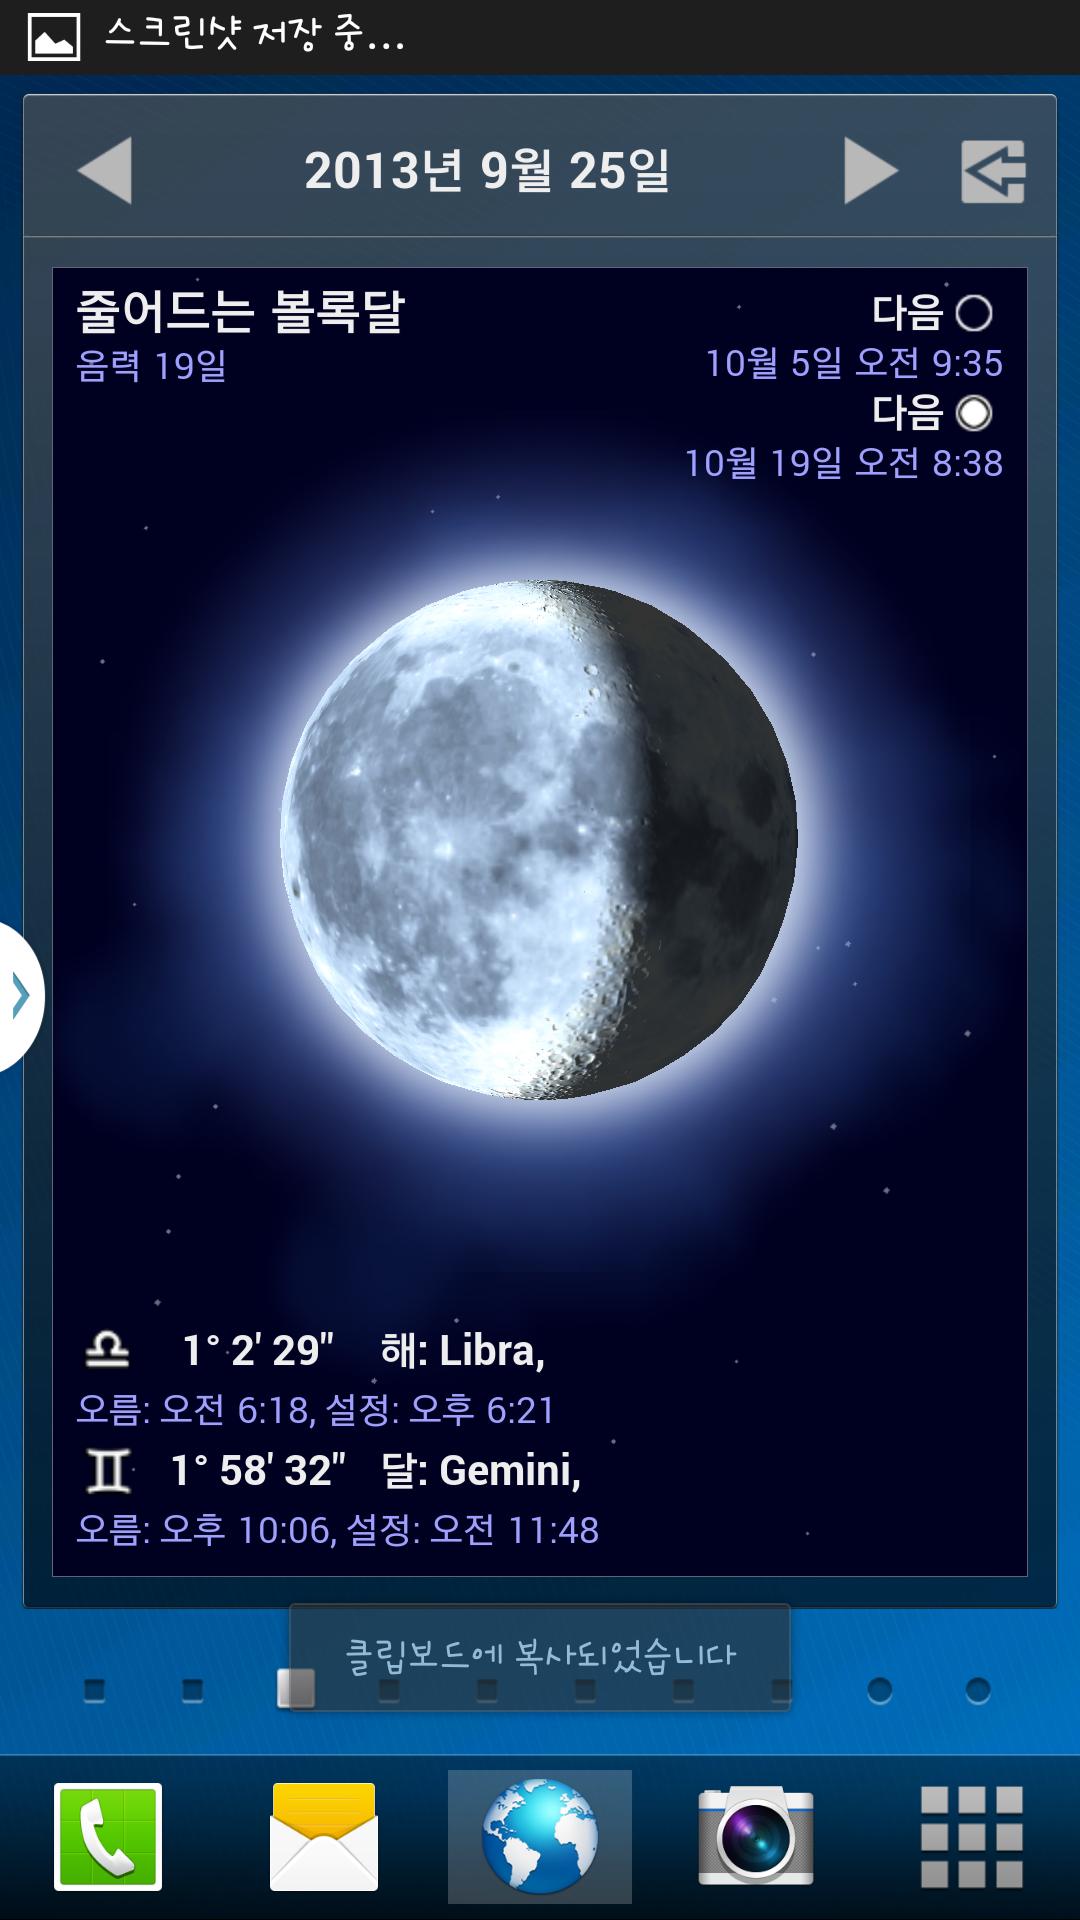 Screenshot_2013-09-25-10-35-49.png